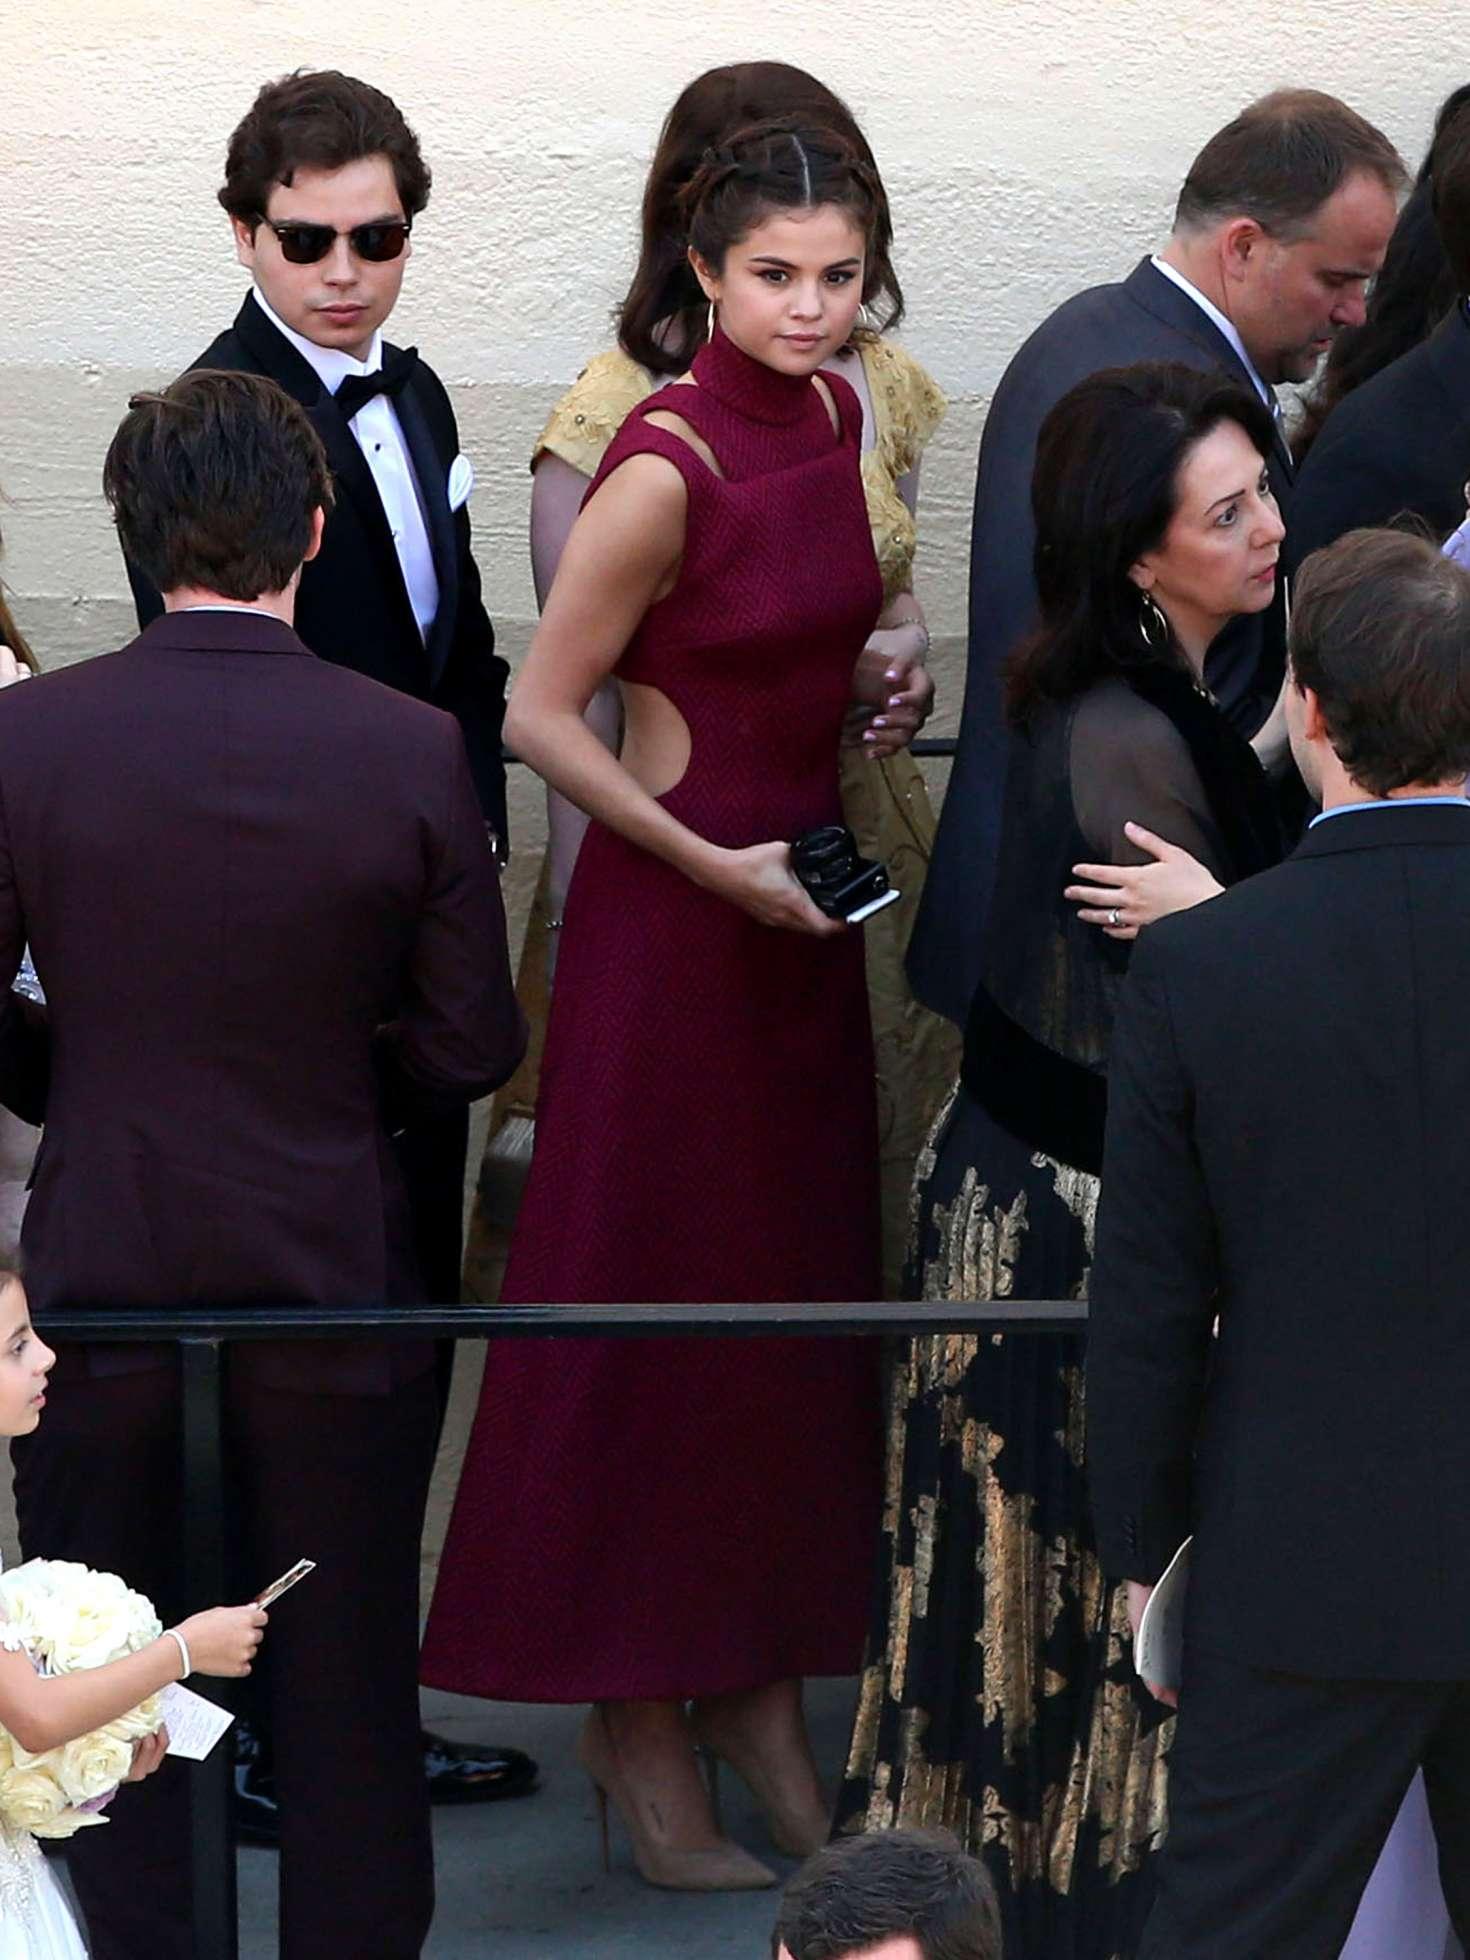 Selena gomez at david henrie maria cahills wedding in la nude (14 photos), Fappening Celebrites pic